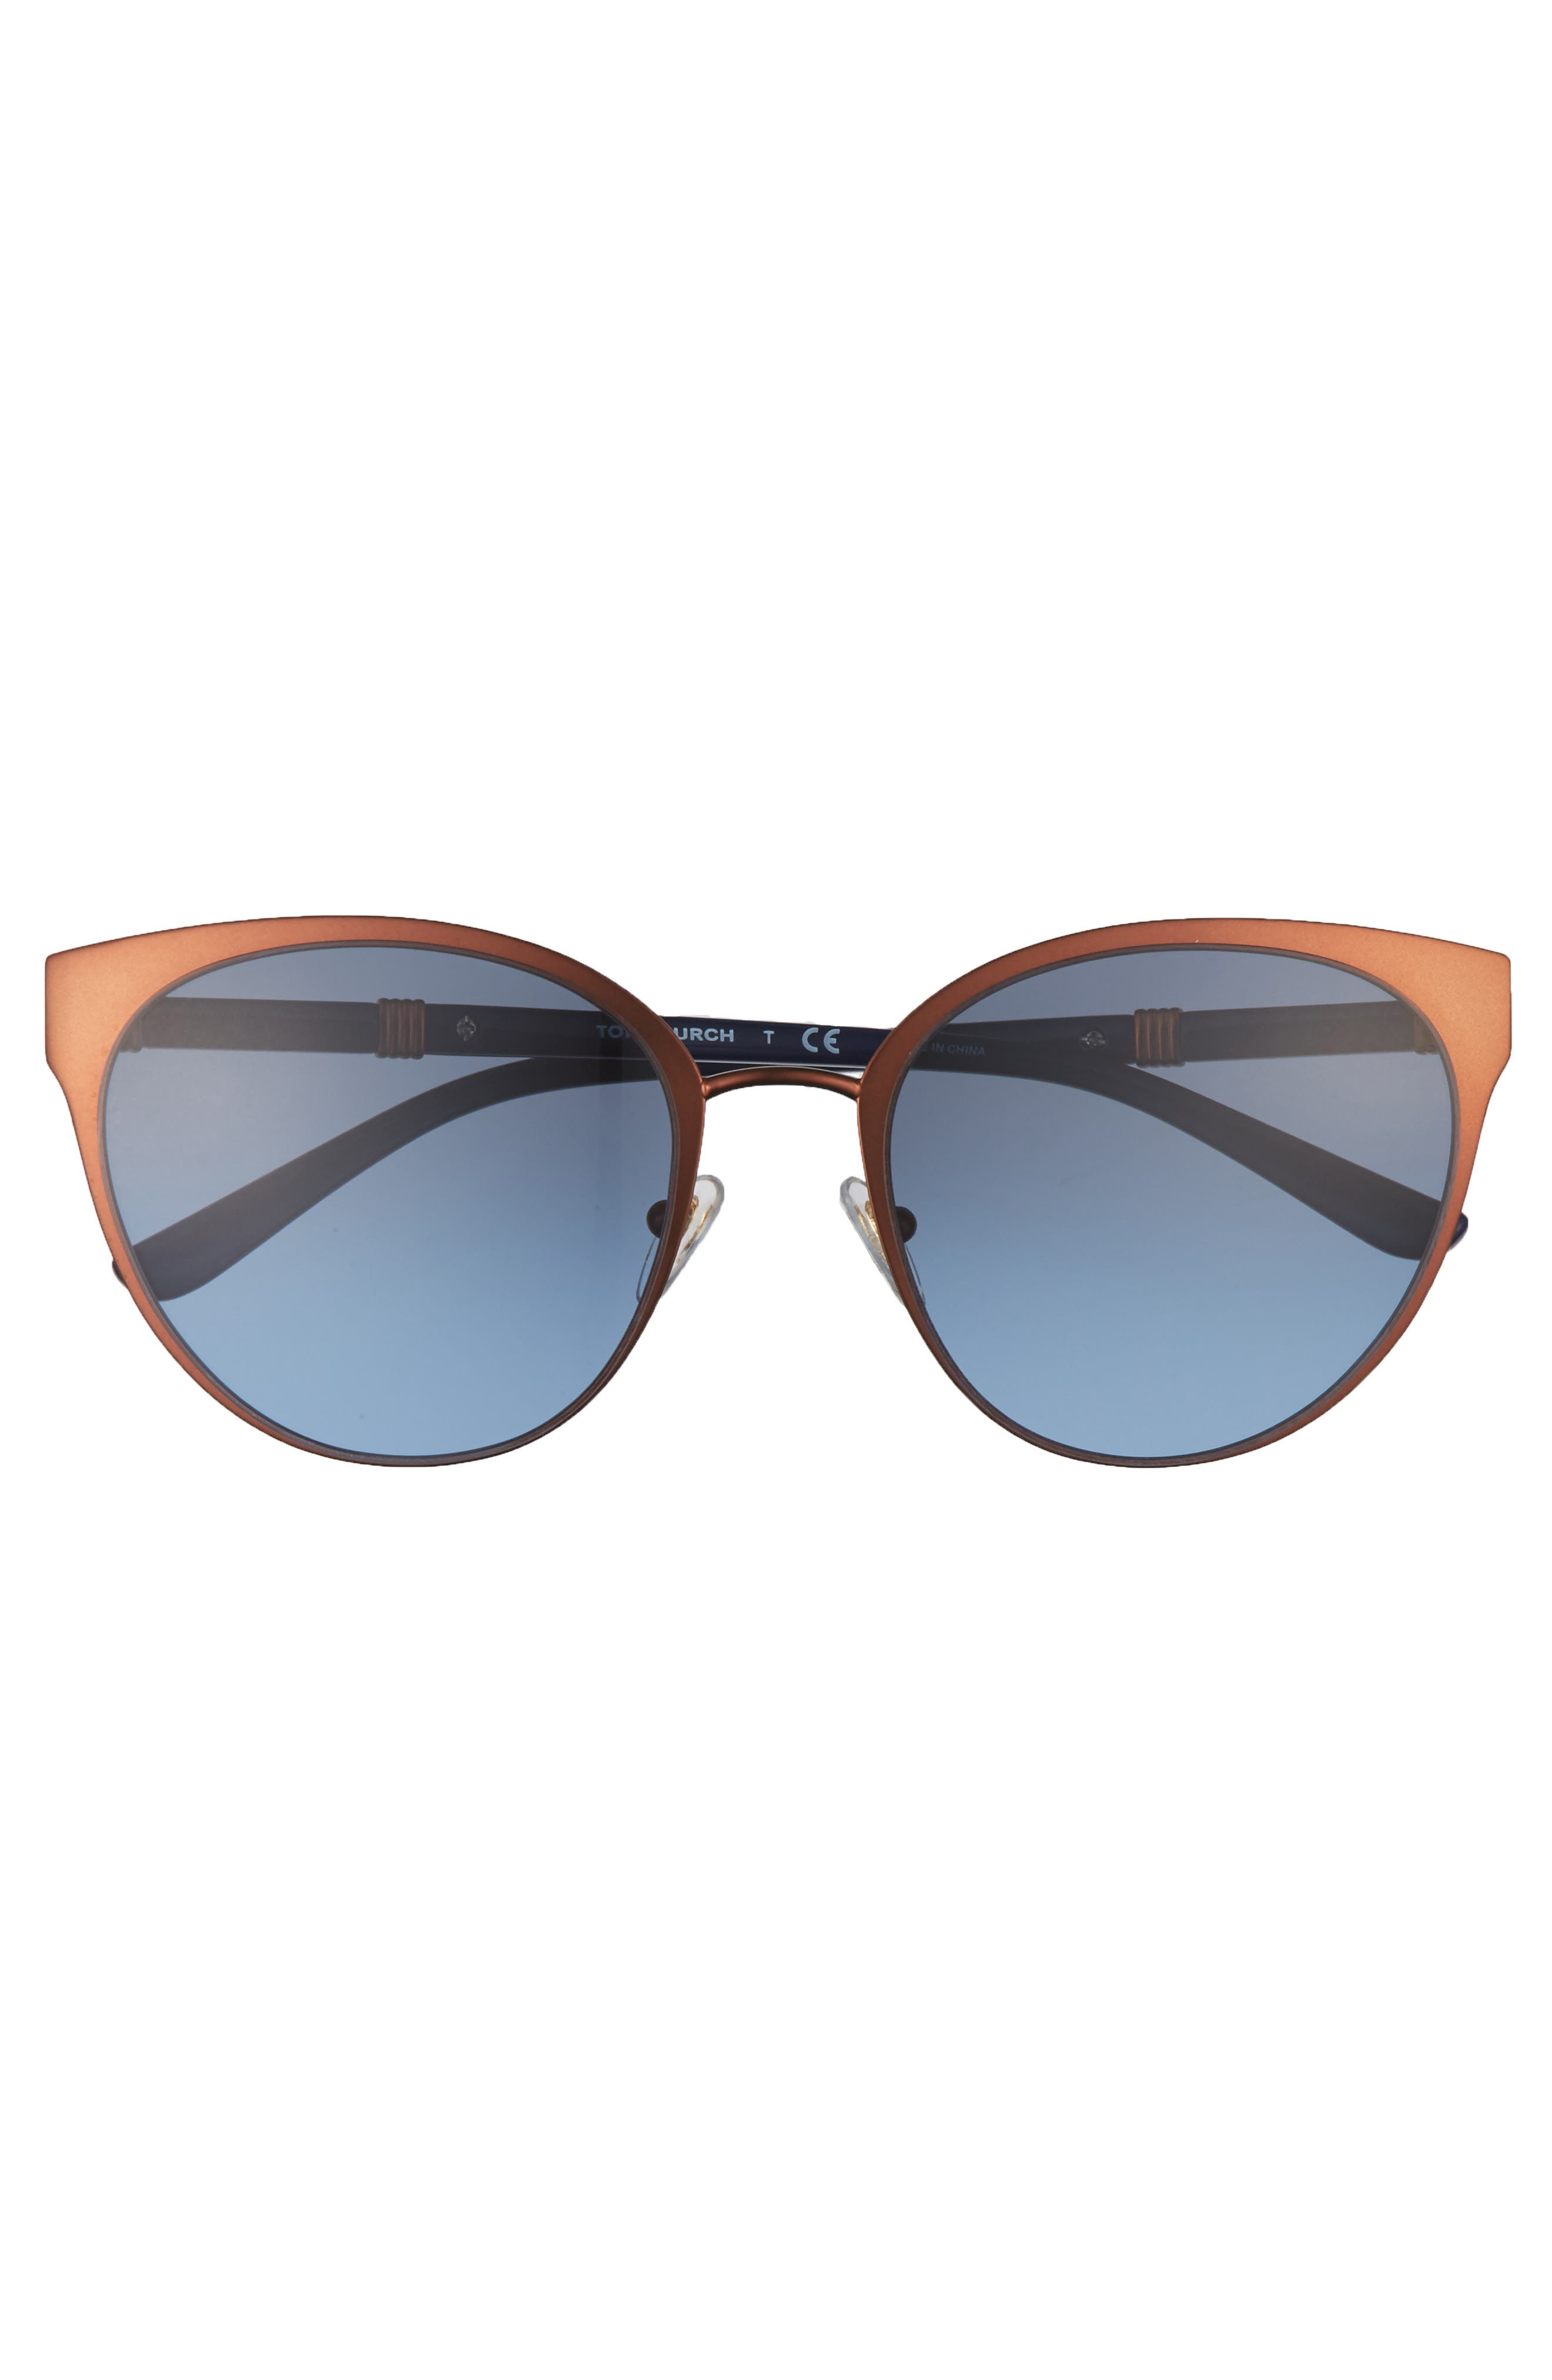 55mm Cat Eye Sunglasses,                             Alternate thumbnail 3, color,                             220